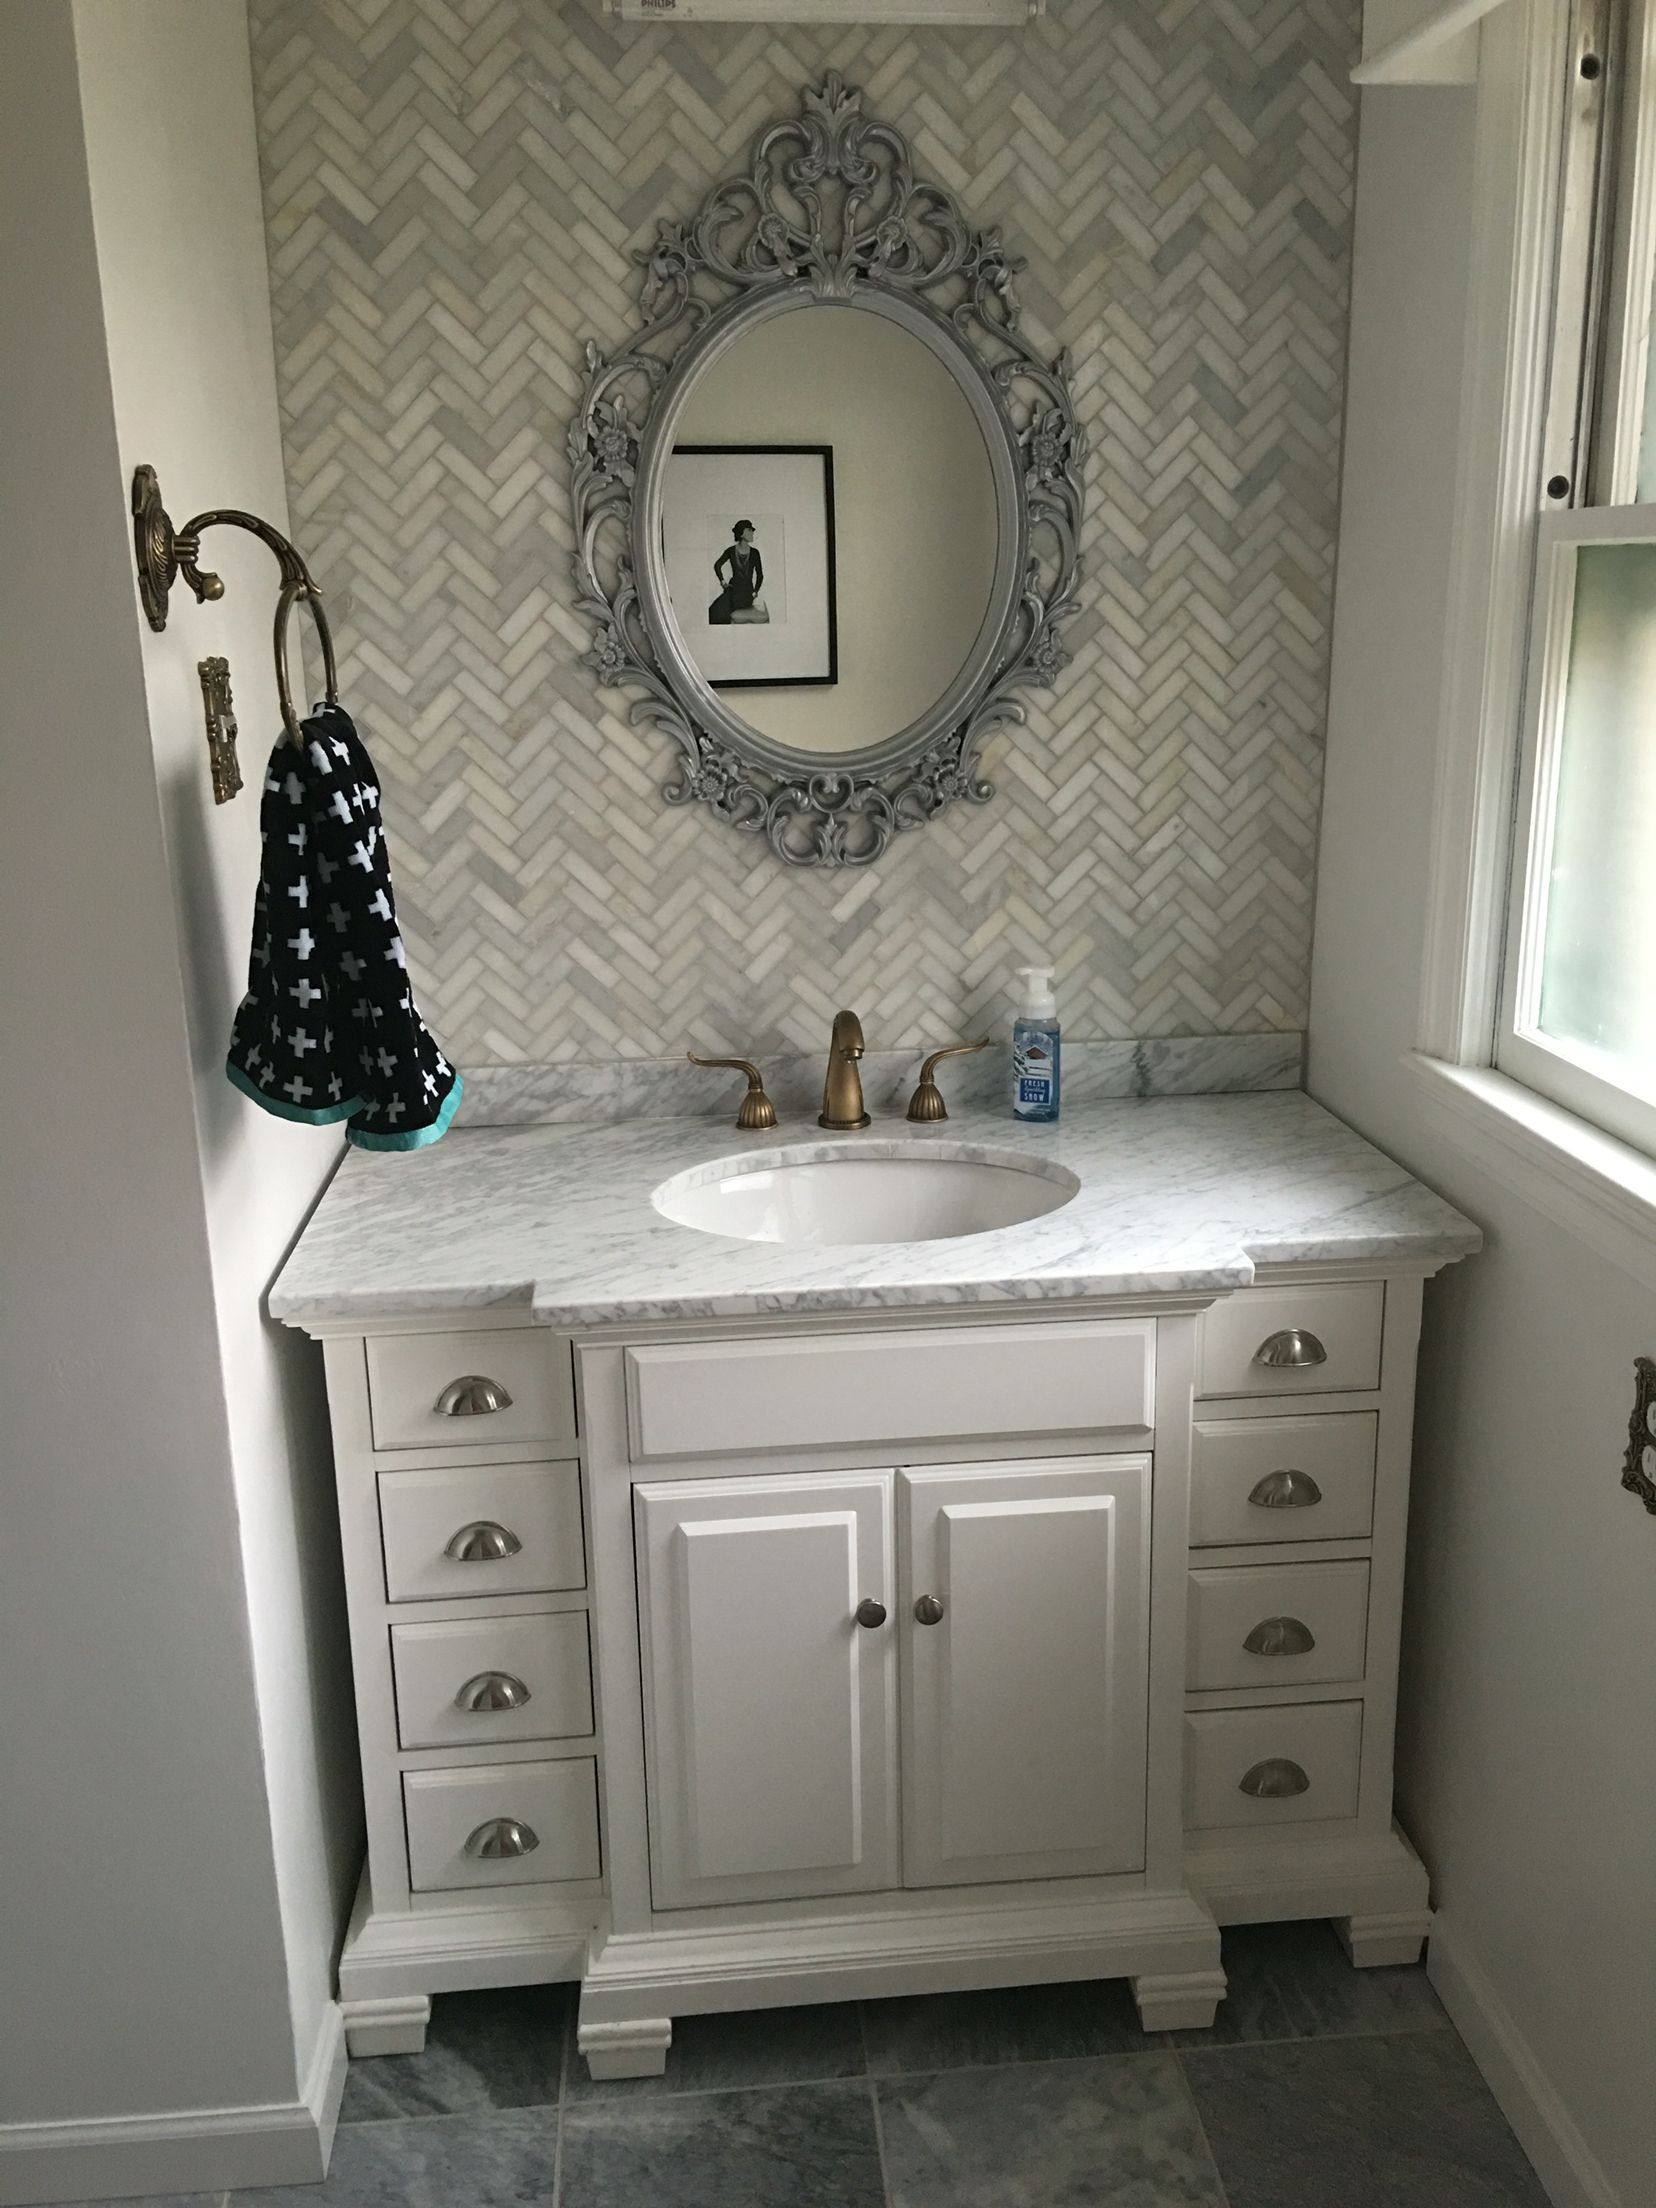 Allen Roth Vanity Chevron Mosaic Back Splash With Gray Marble